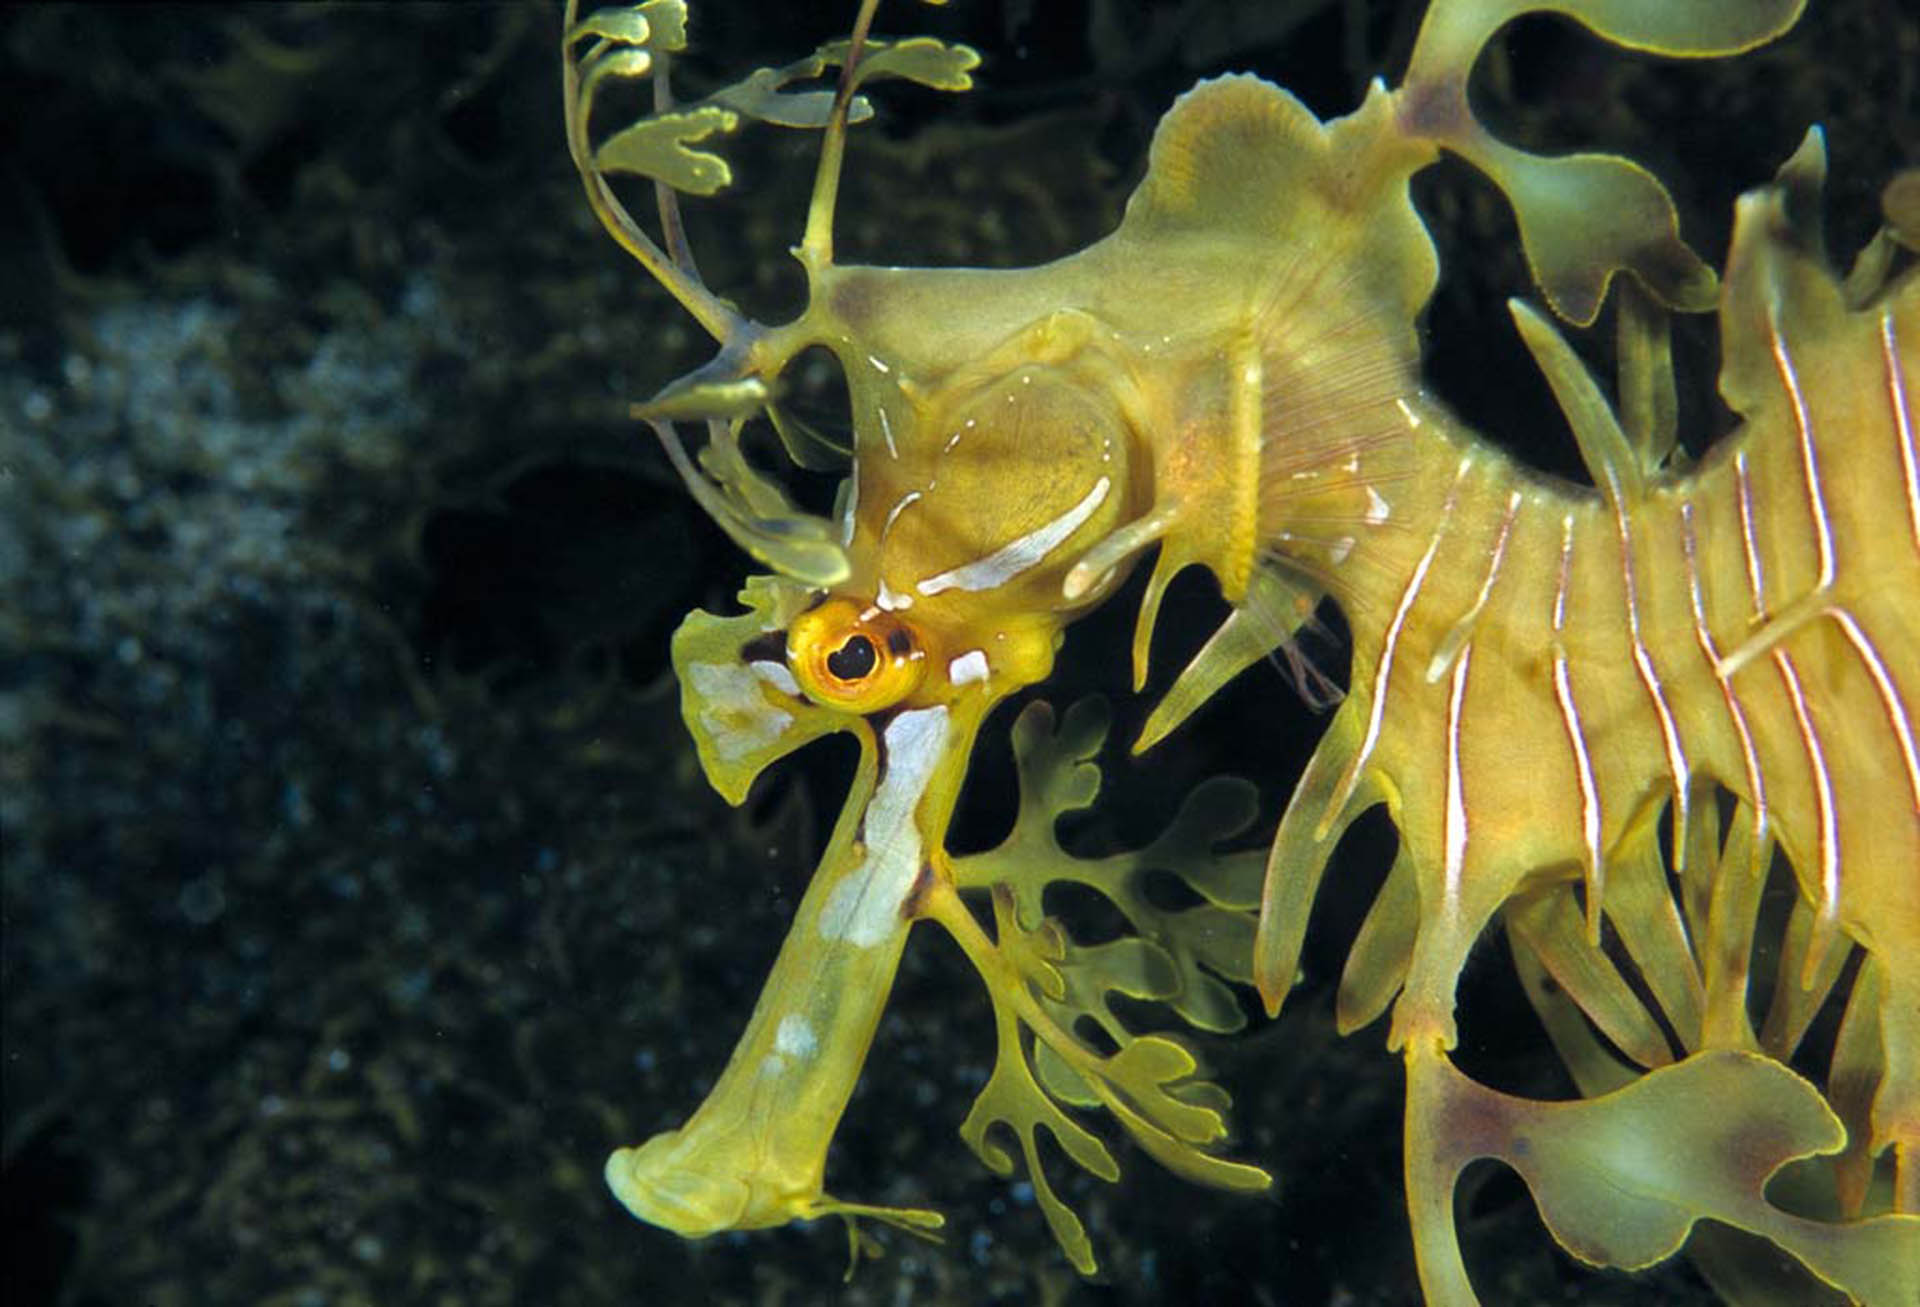 dos-winkel-leafy-sea-dragon-onderwater-fotografie